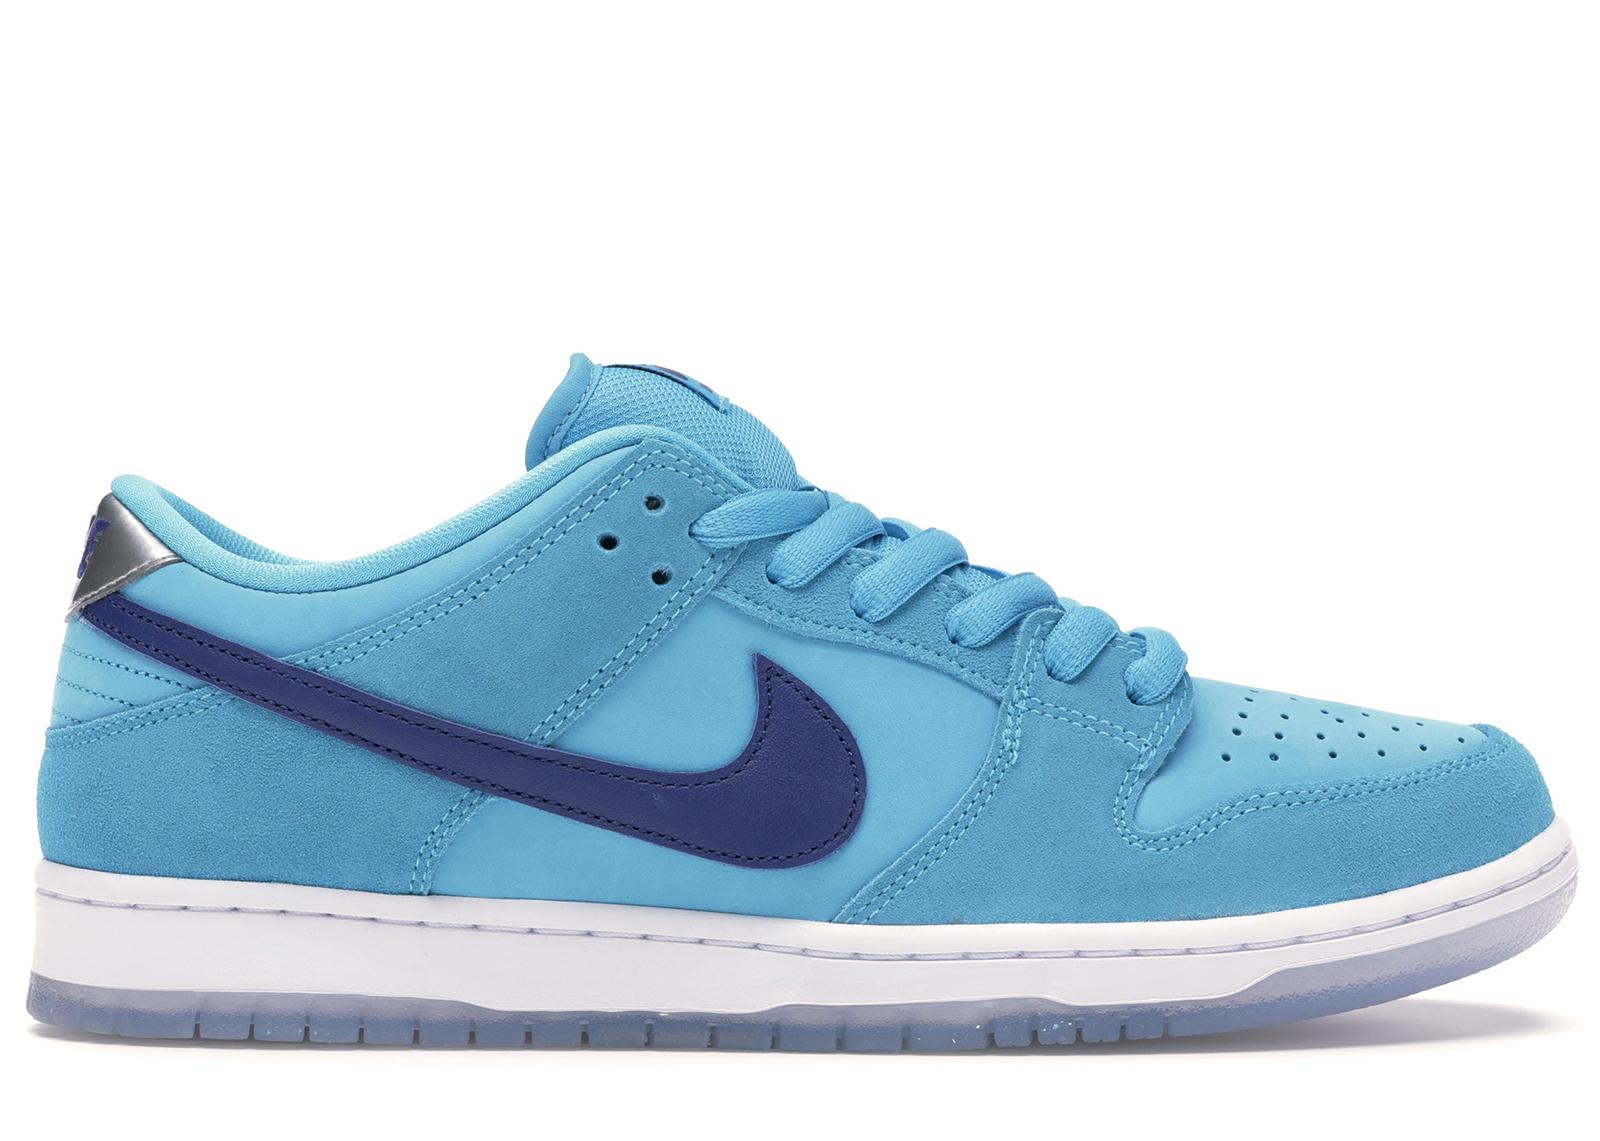 Nike SB Dunk Low Pro Blue Fury - BQ6817-400